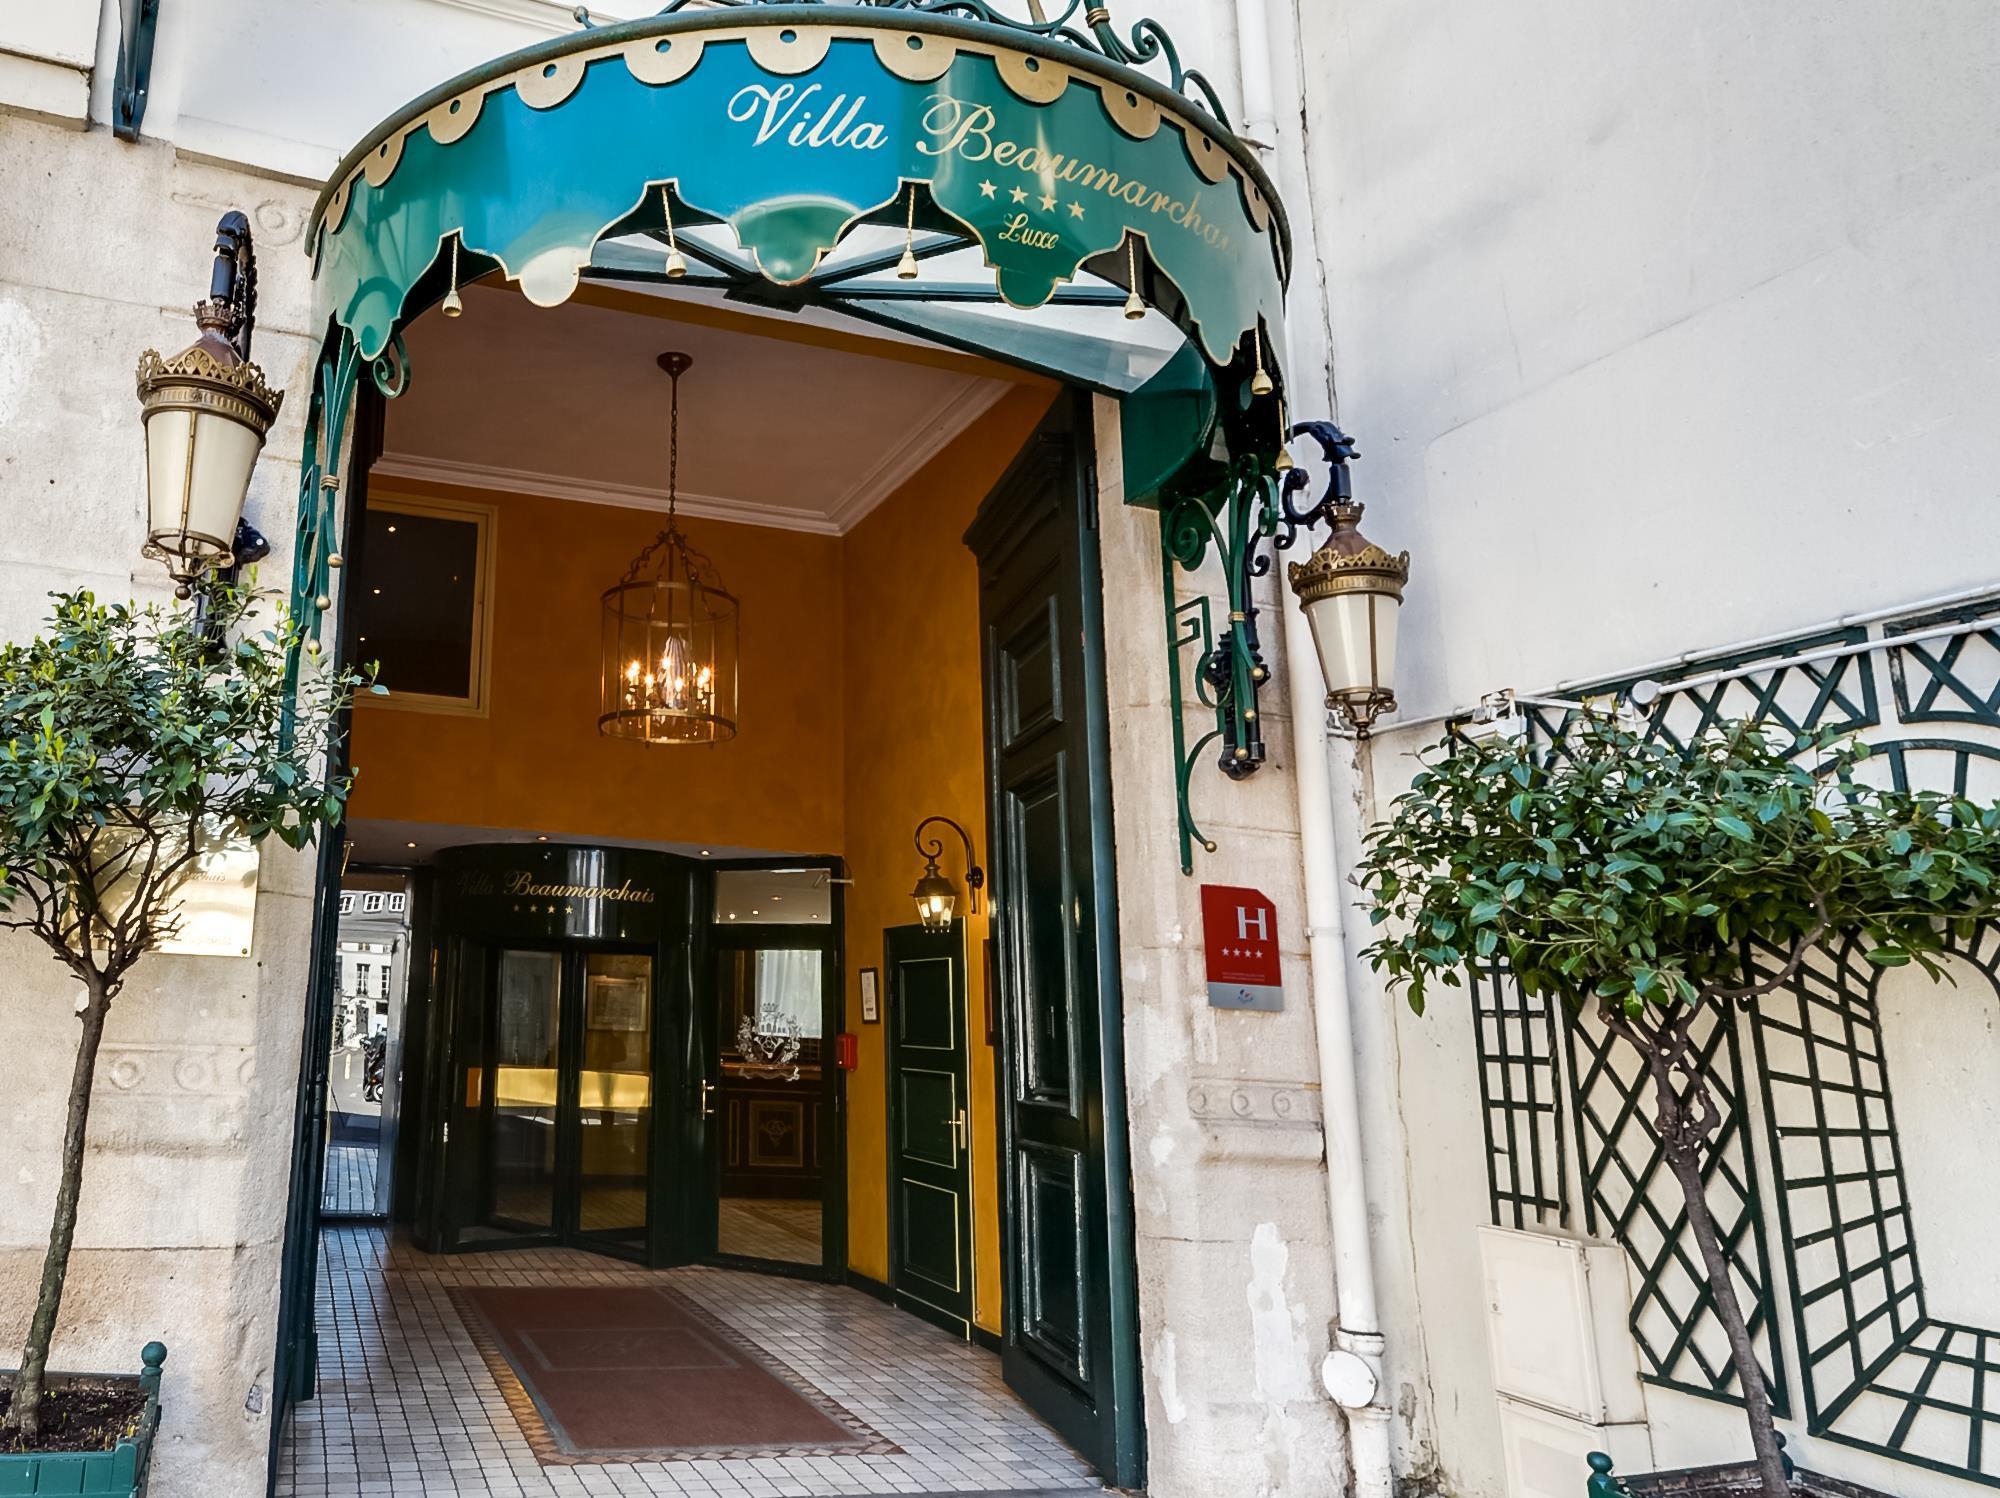 Villa Beaumarchais Hotel